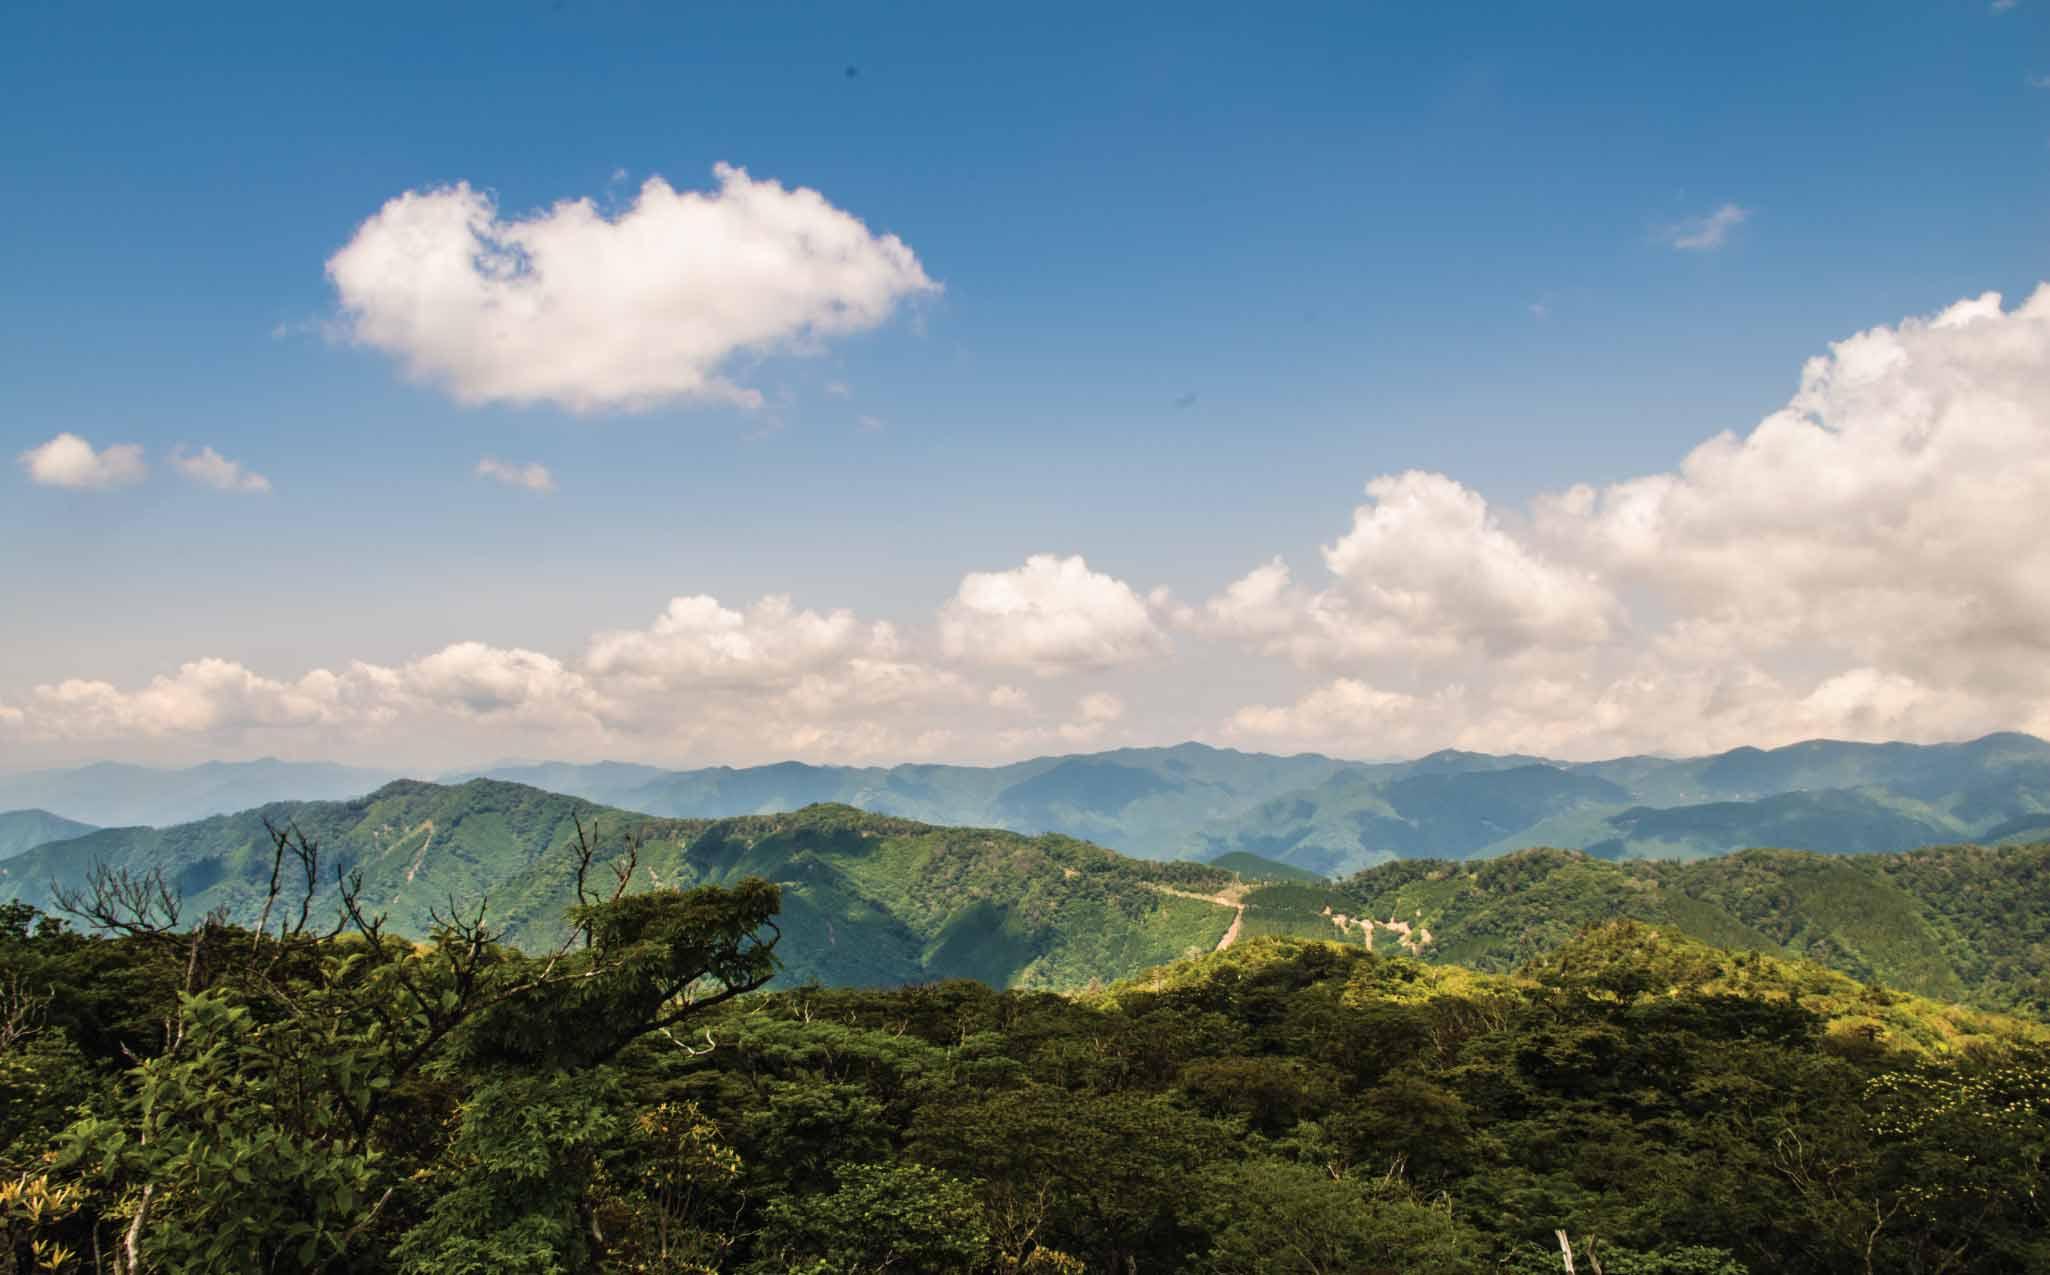 Gokanosho Mountain Trekking